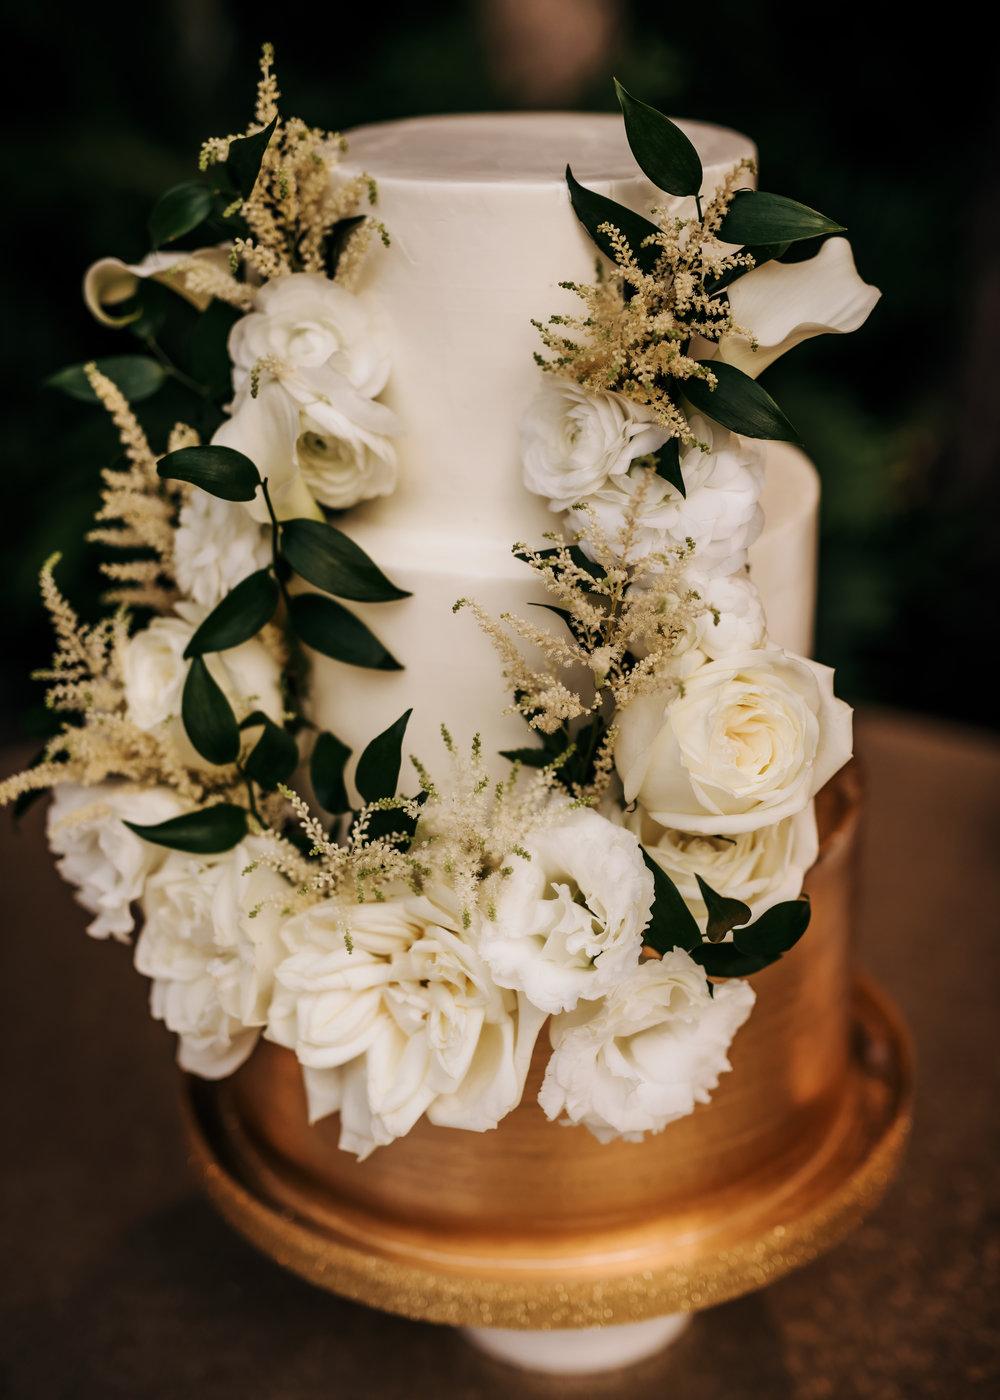 Turchin_20180825_Austinae-Brent-Wedding_450.jpg